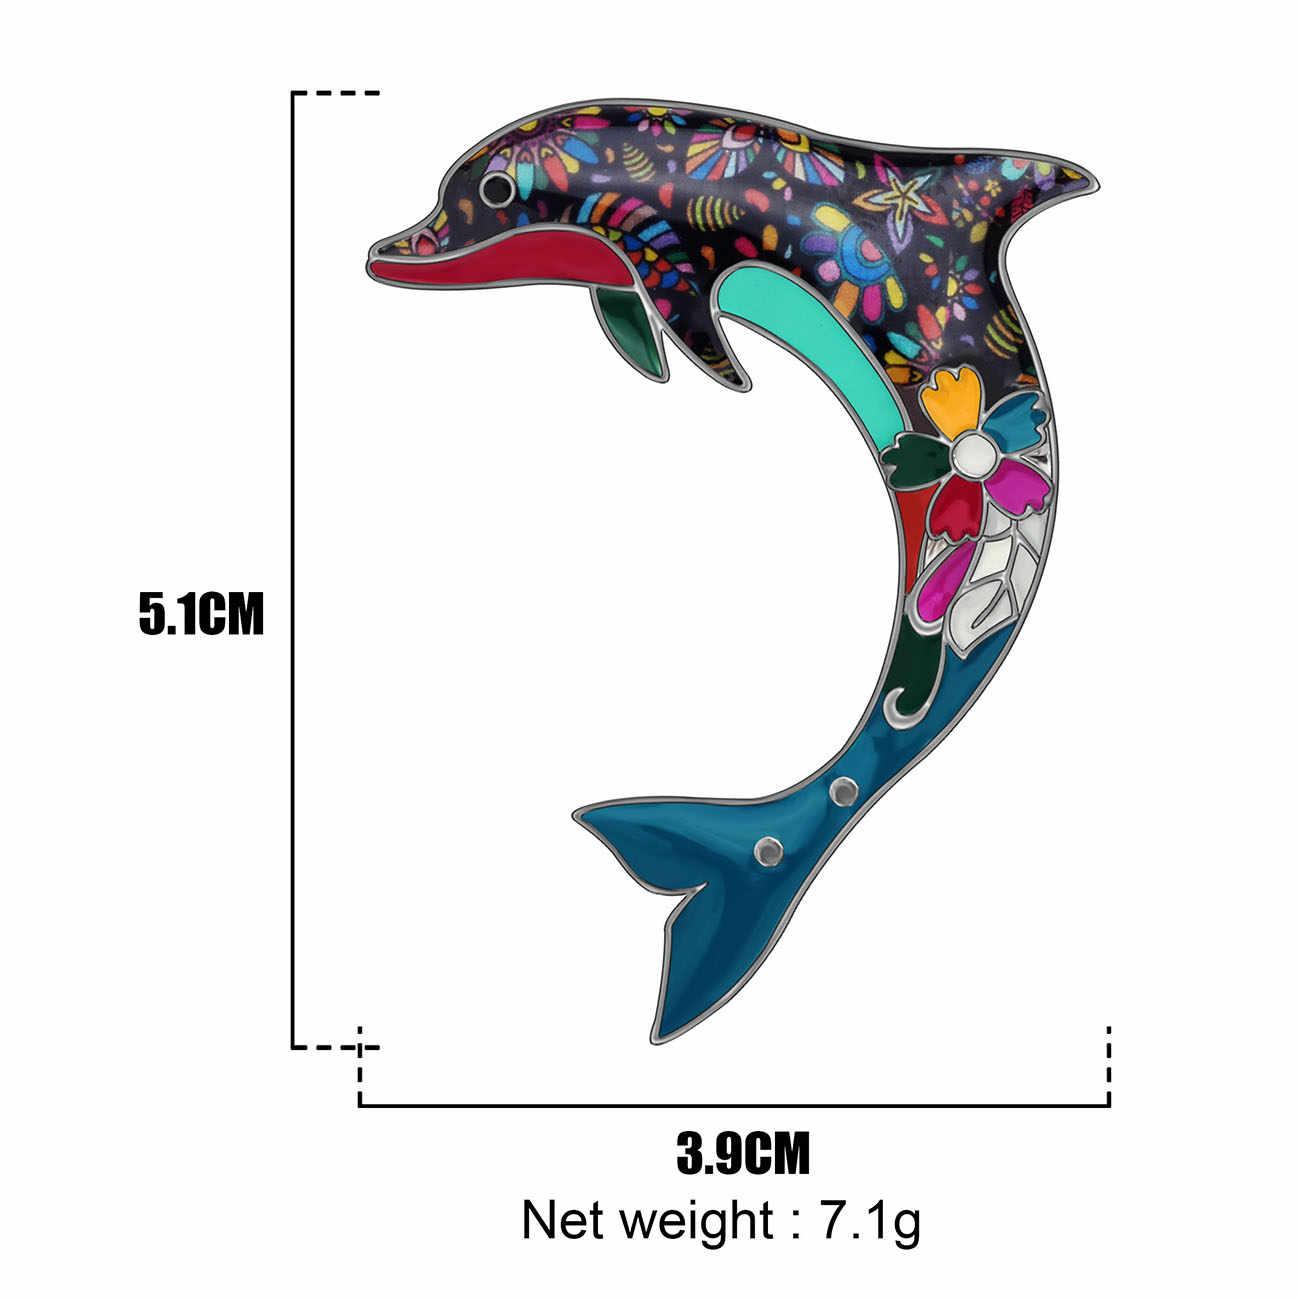 Bonsny Enamel Alloy Laut Lumba-lumba Bros Hewan Lucu Pin Perhiasan untuk Wanita Gadis Remaja Syal Pakaian Dekorasi Hadiah 2019 Baru